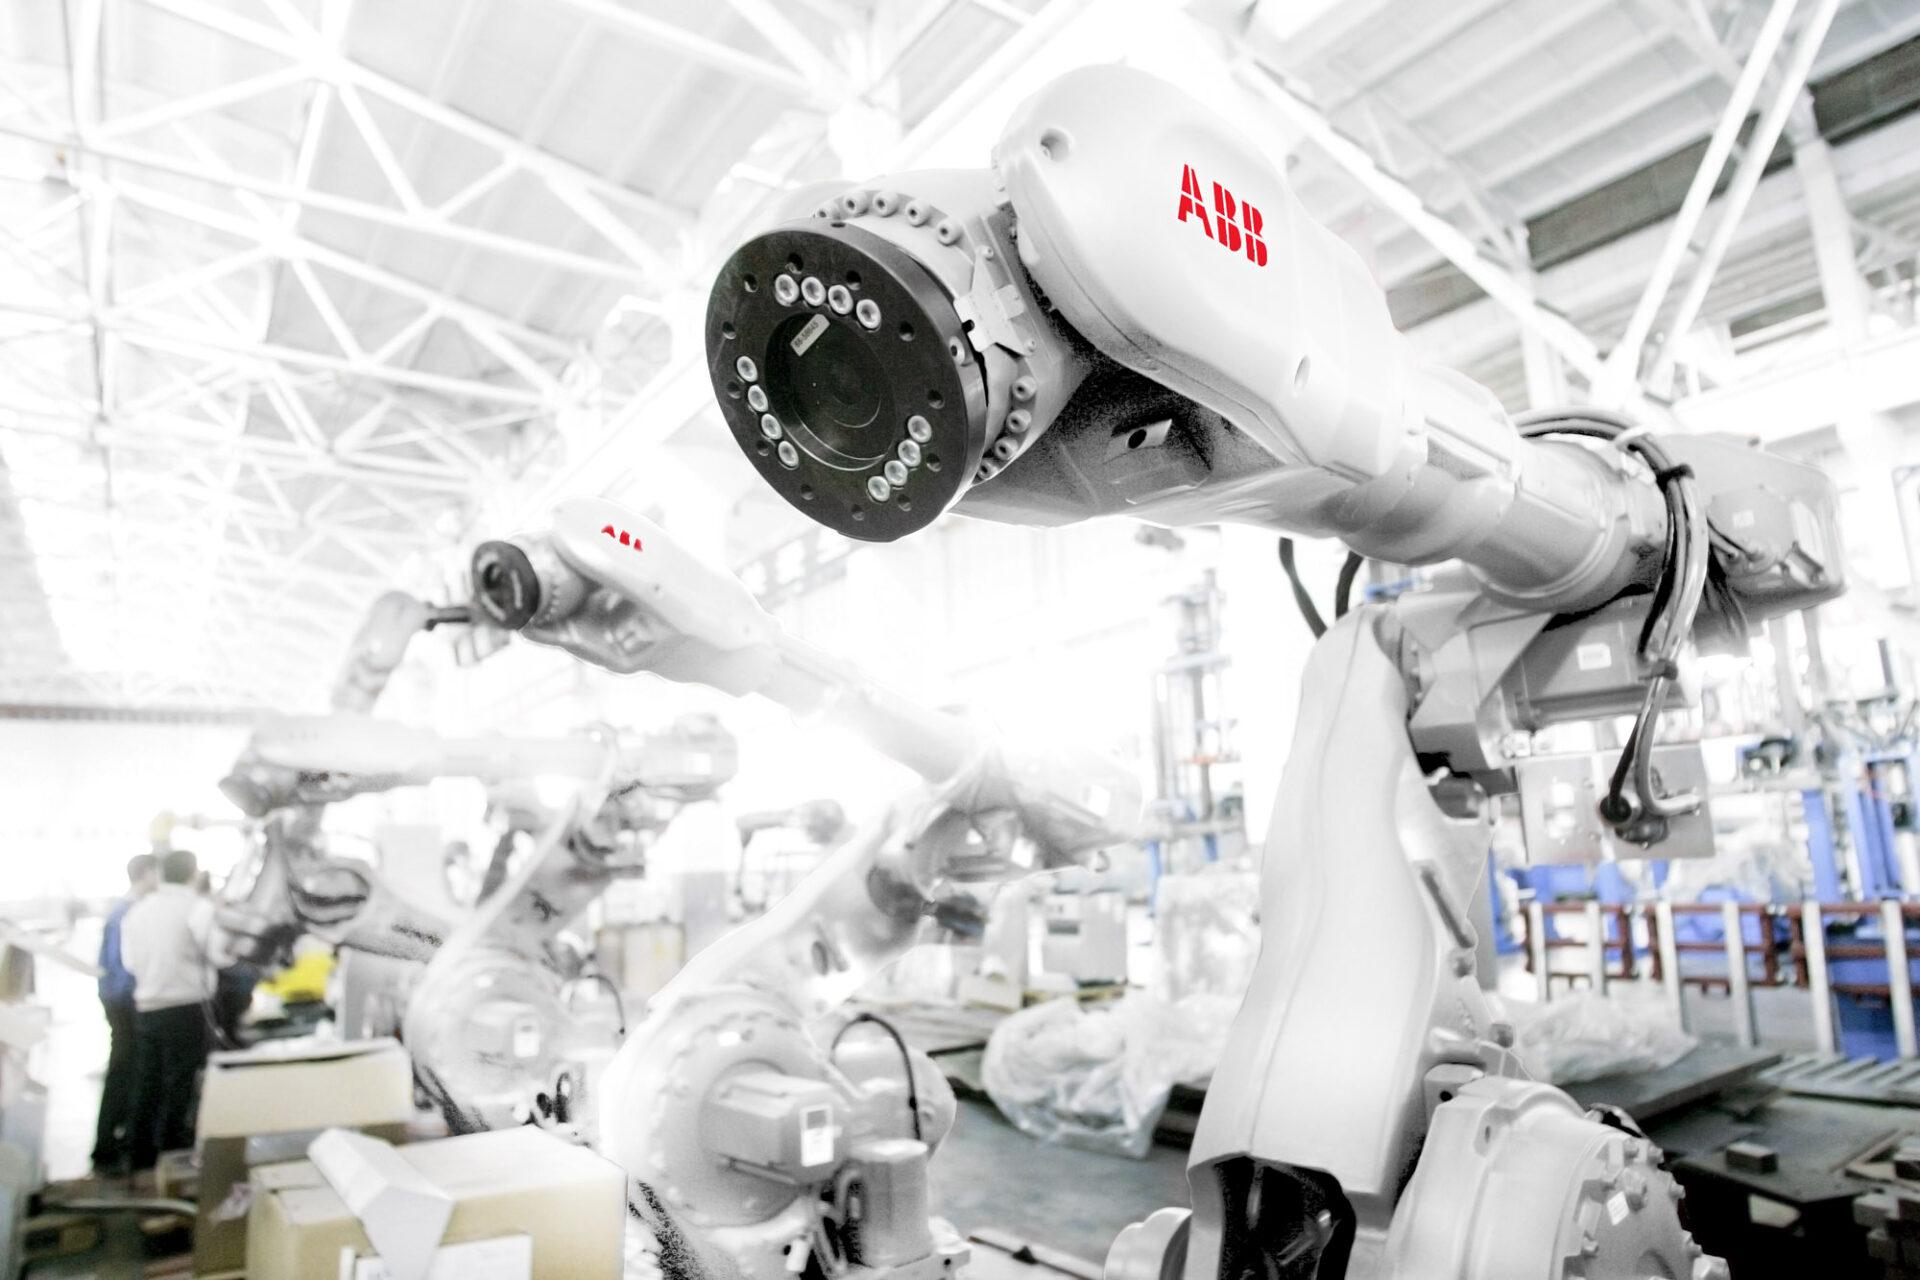 ArtiMinds Robotics - ArtiMinds RPS as an alternative to ABB's simulation software RobotStudio